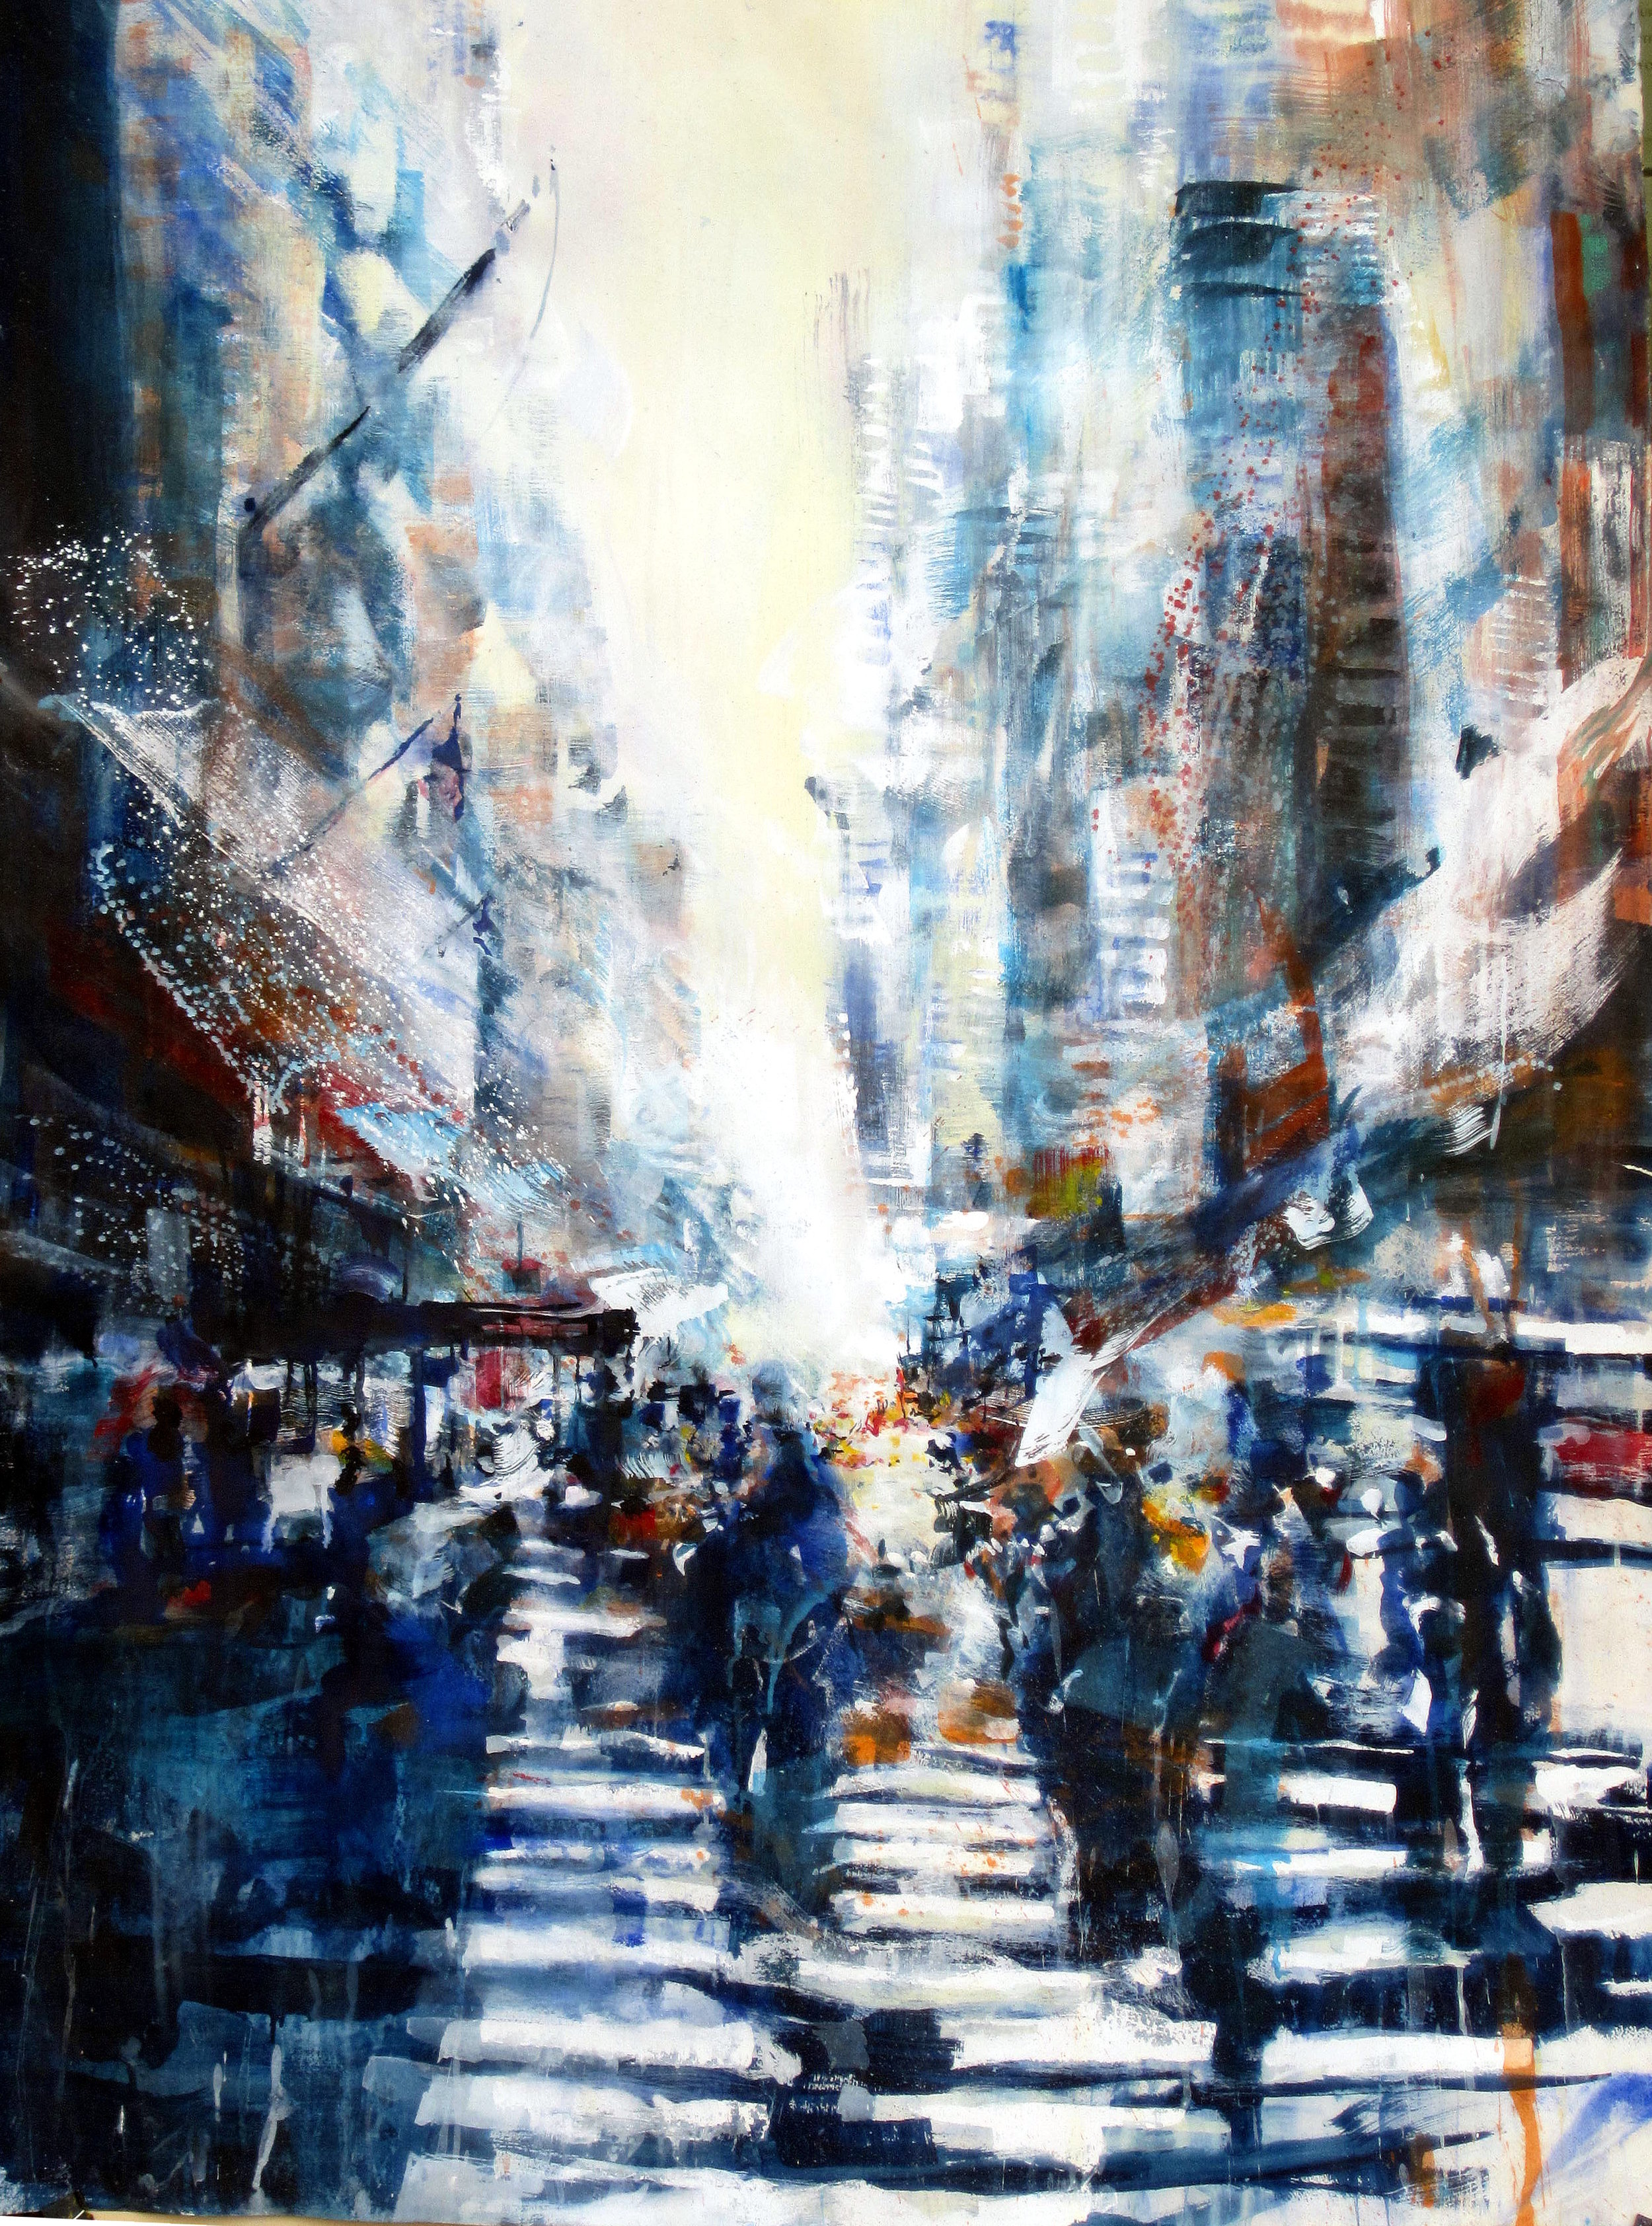 """New York - Cascading"" 152 x 108 cm"